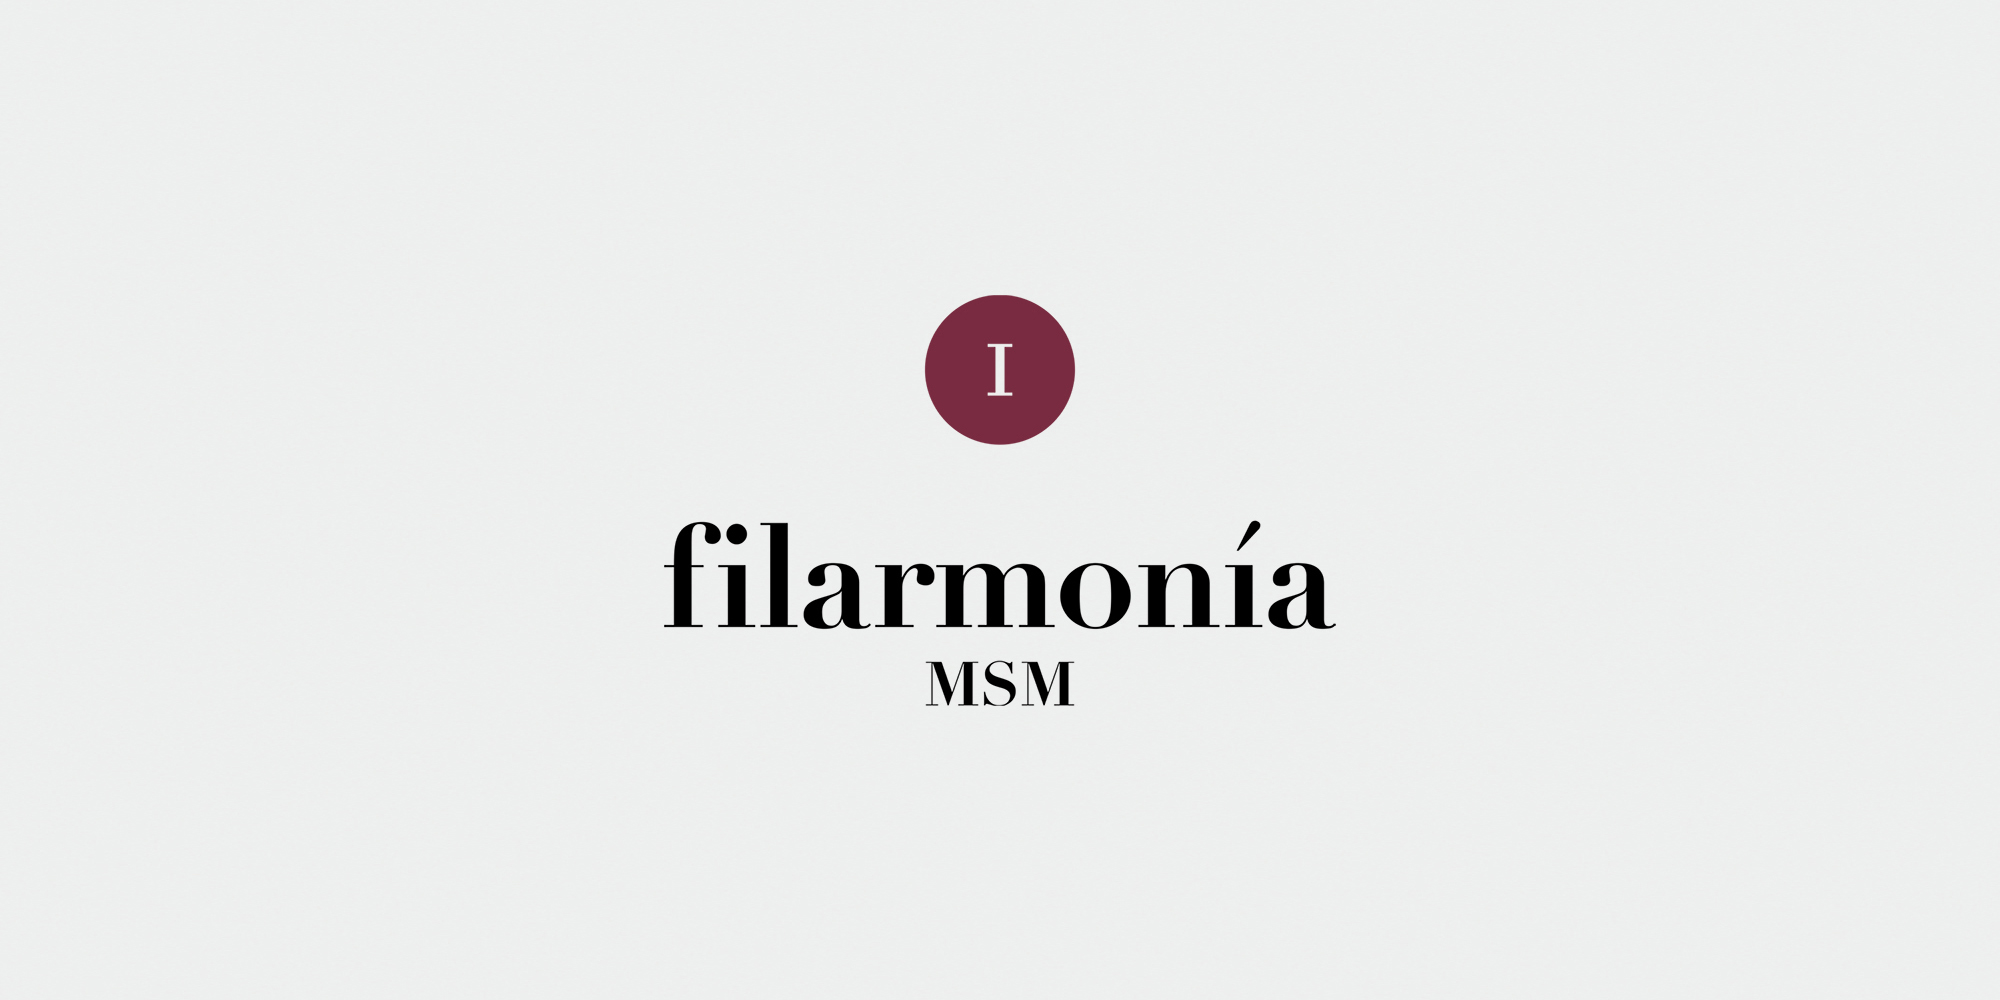 Filarmonía MSM WINE DESIGN ARMODER